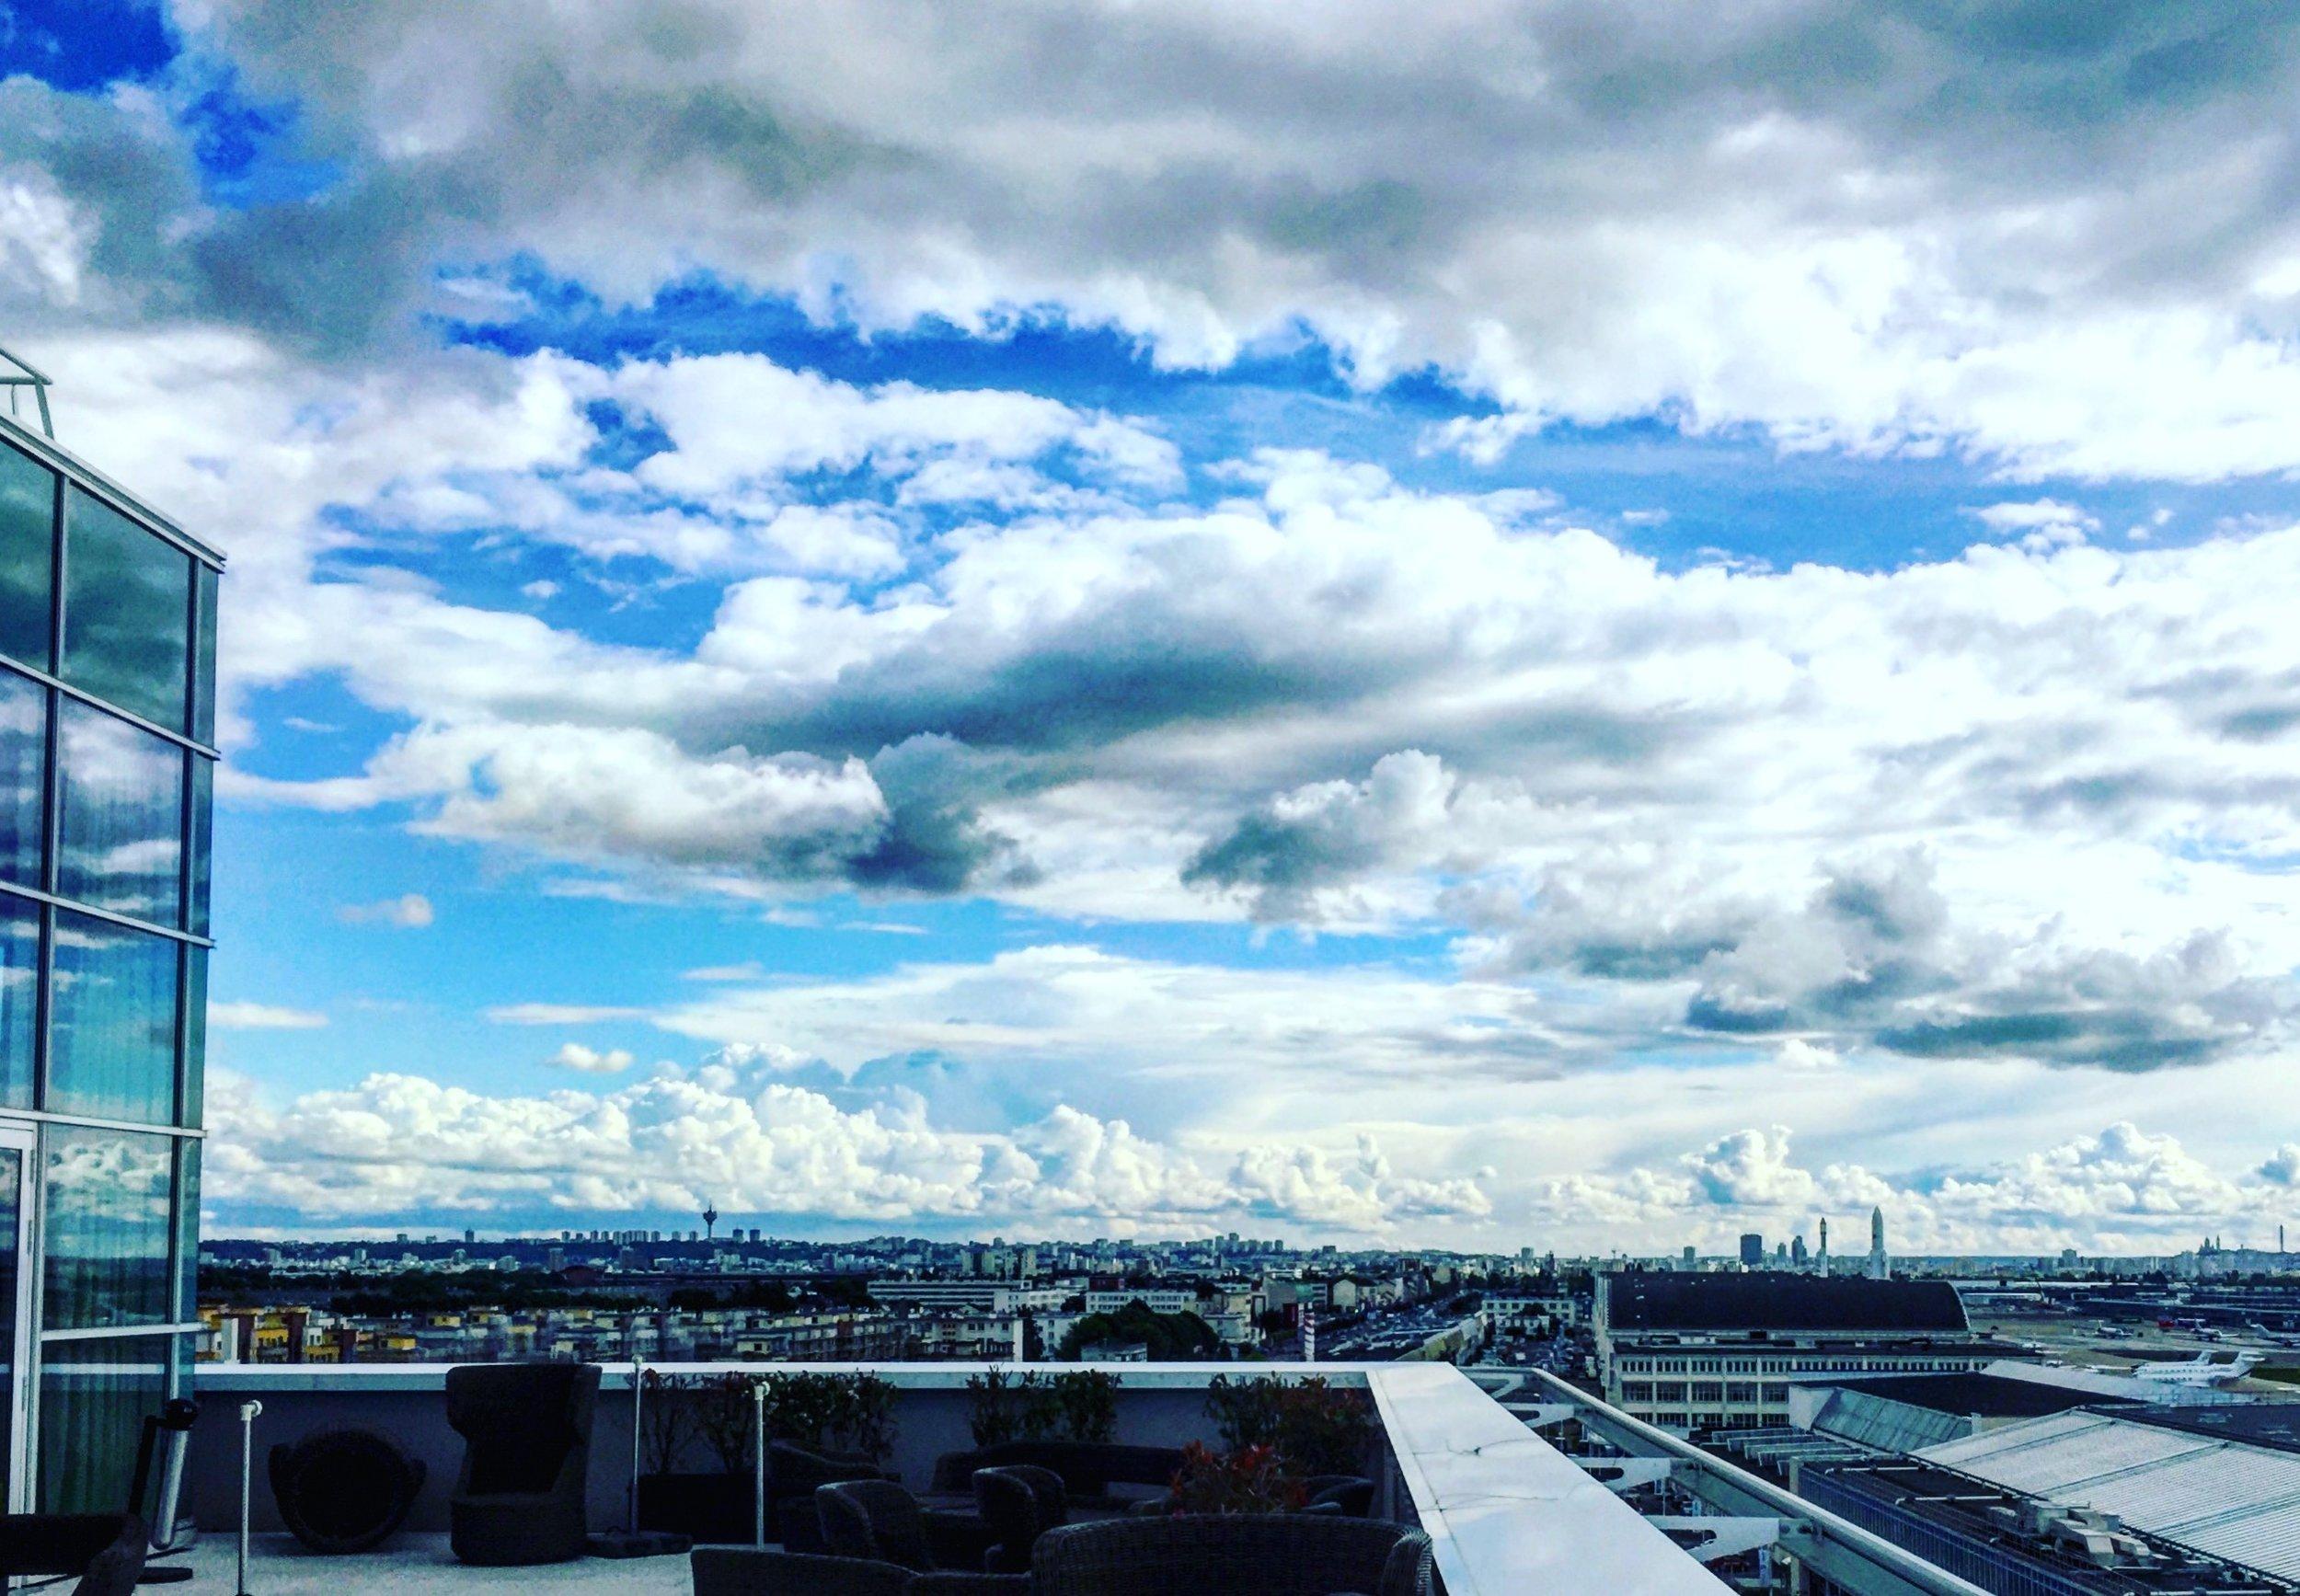 Paris, in the distance